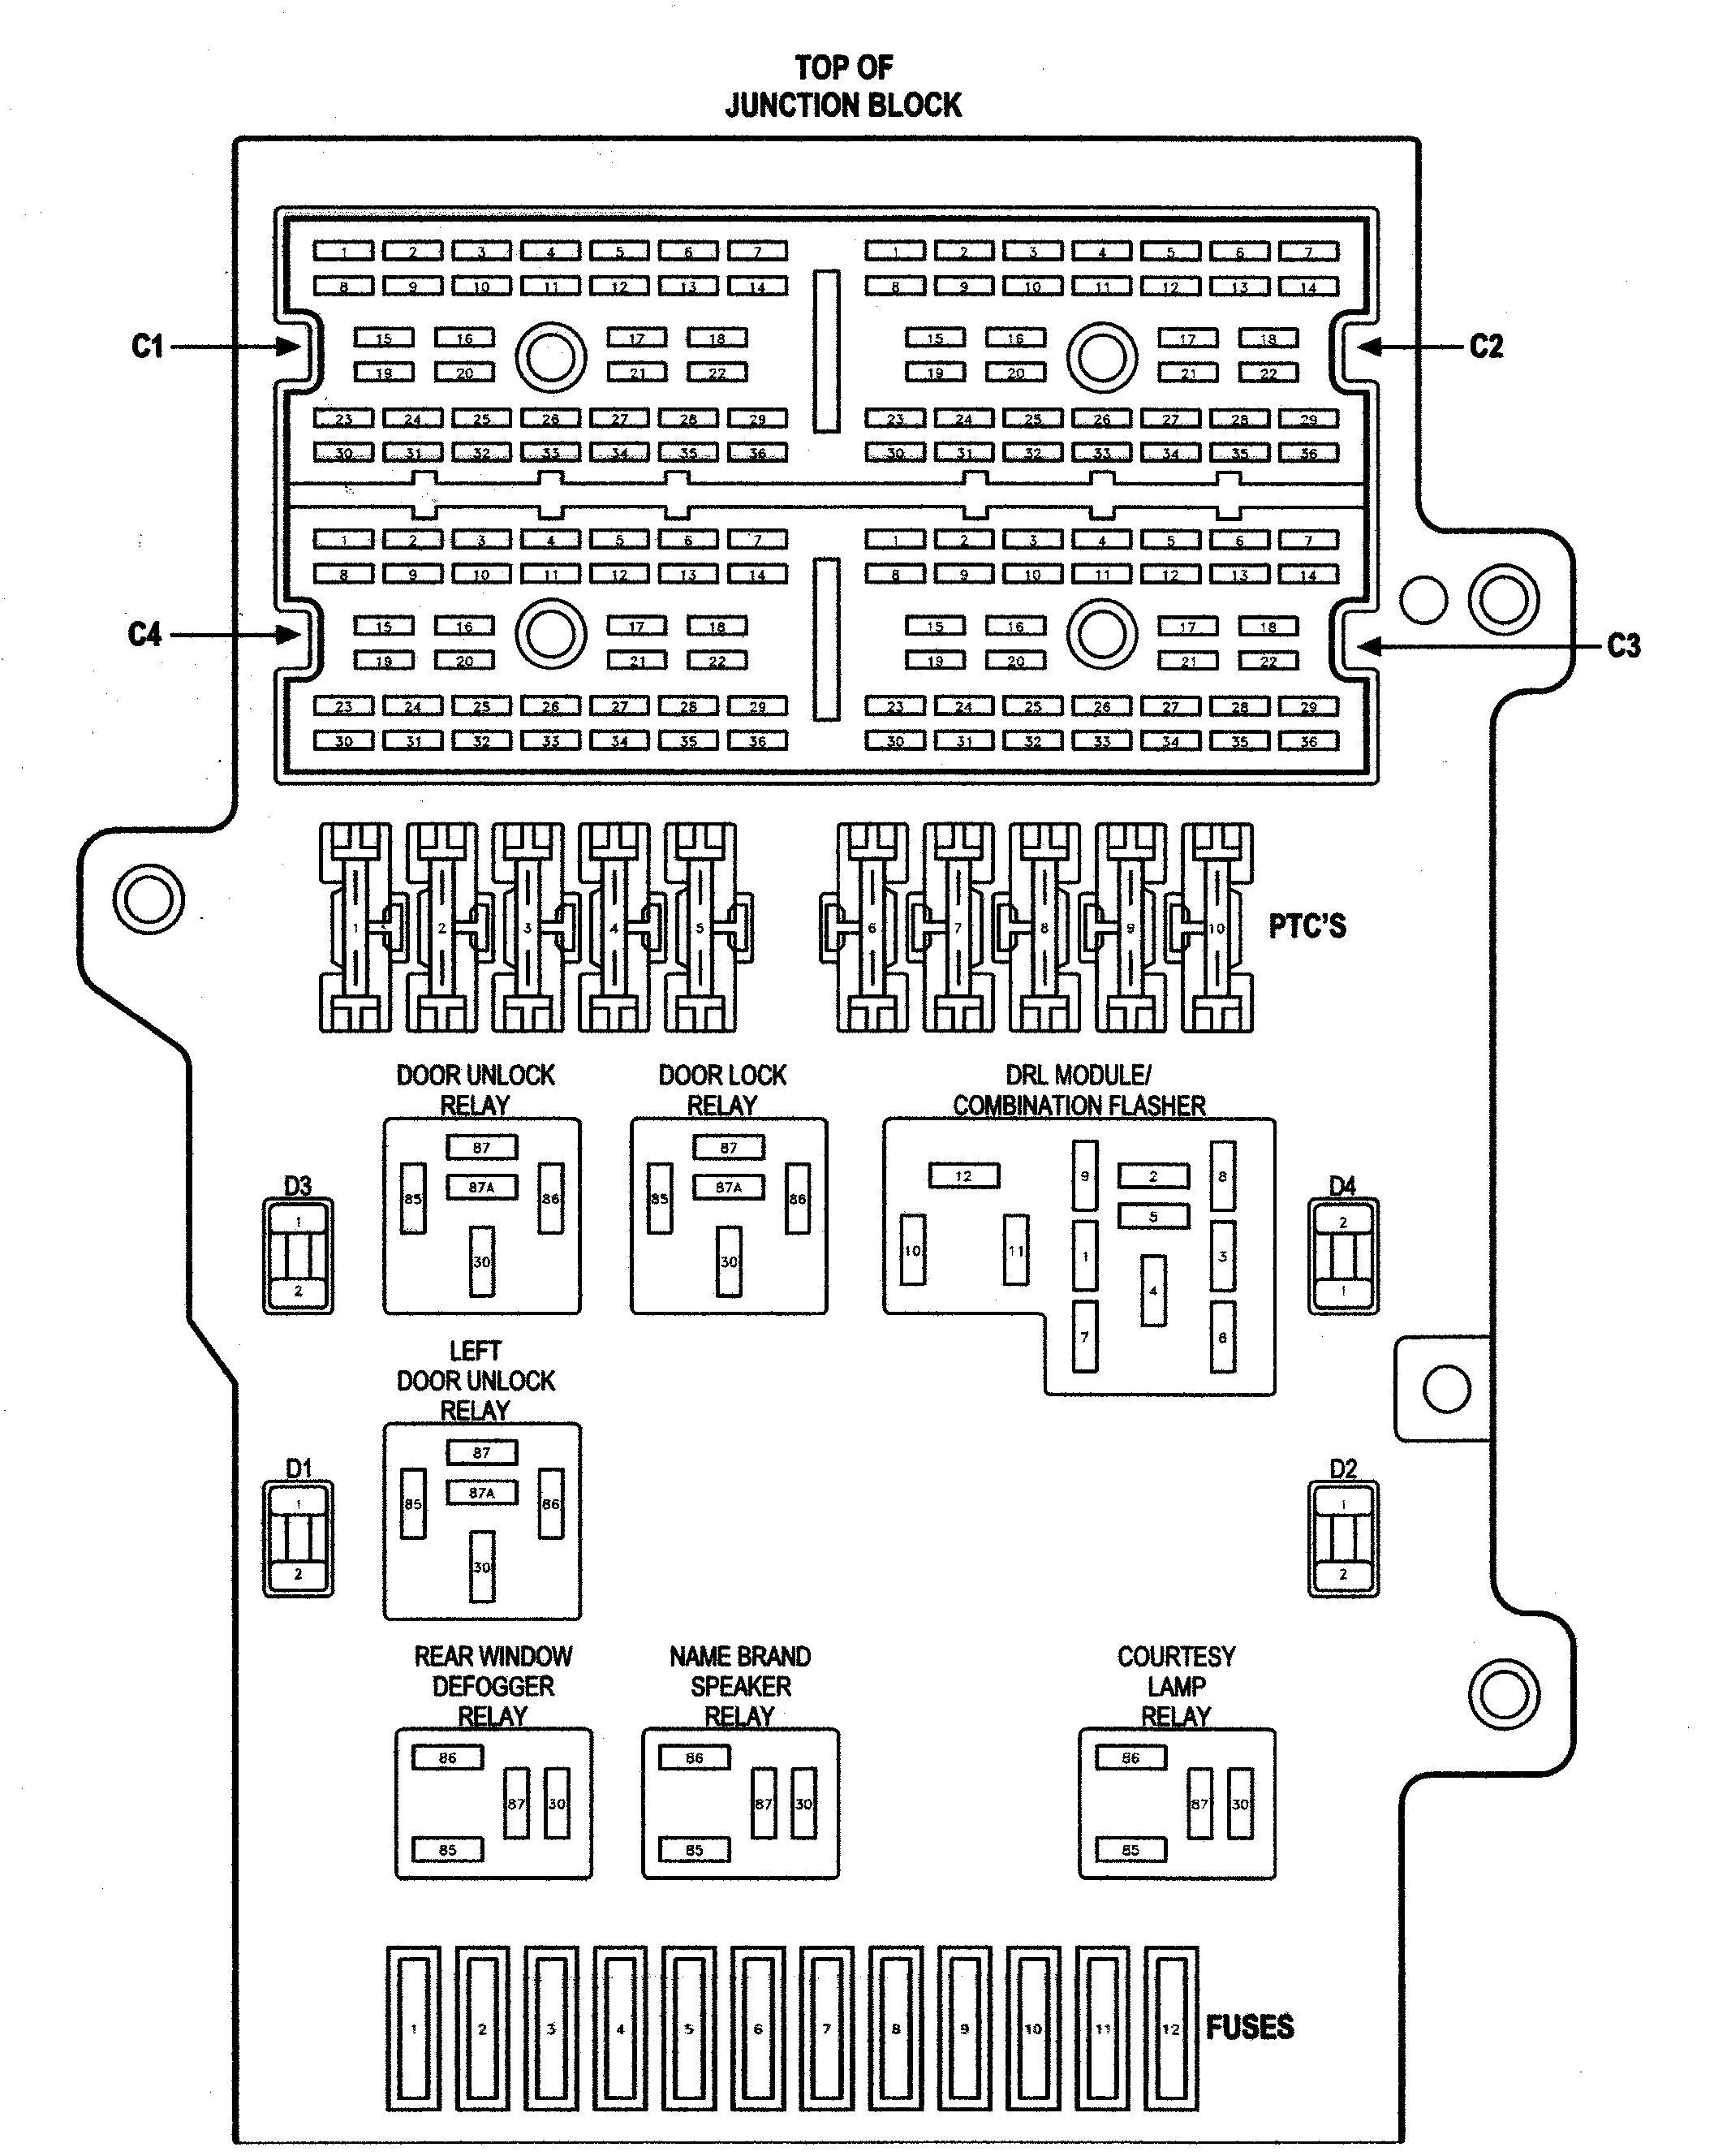 2000 Chrysler 300m Fuse Box Diagram Wiring Diagram Frankmotors Es